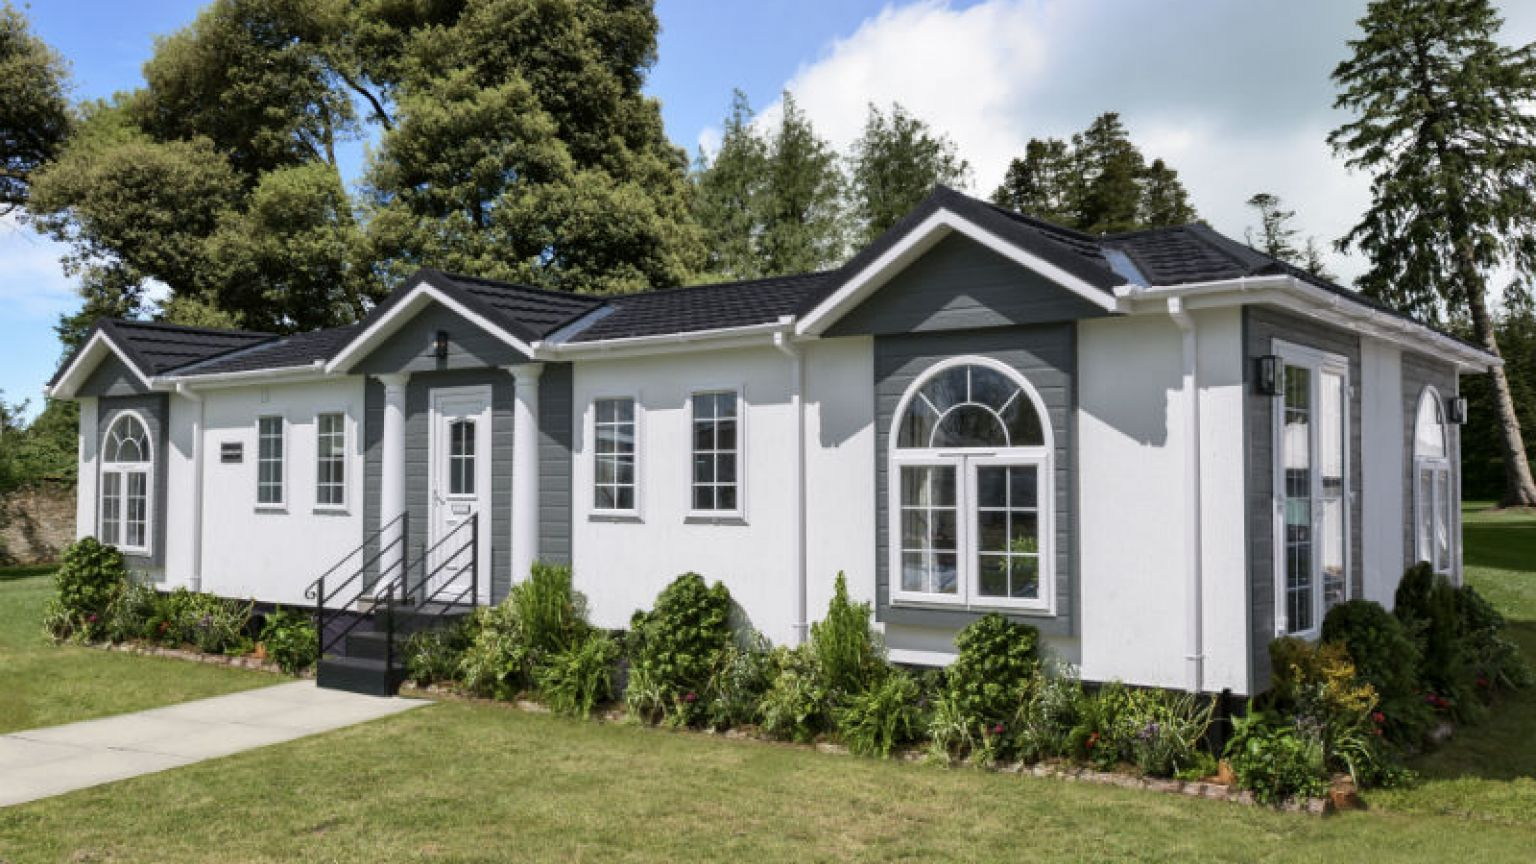 The Kensington Park Home Review